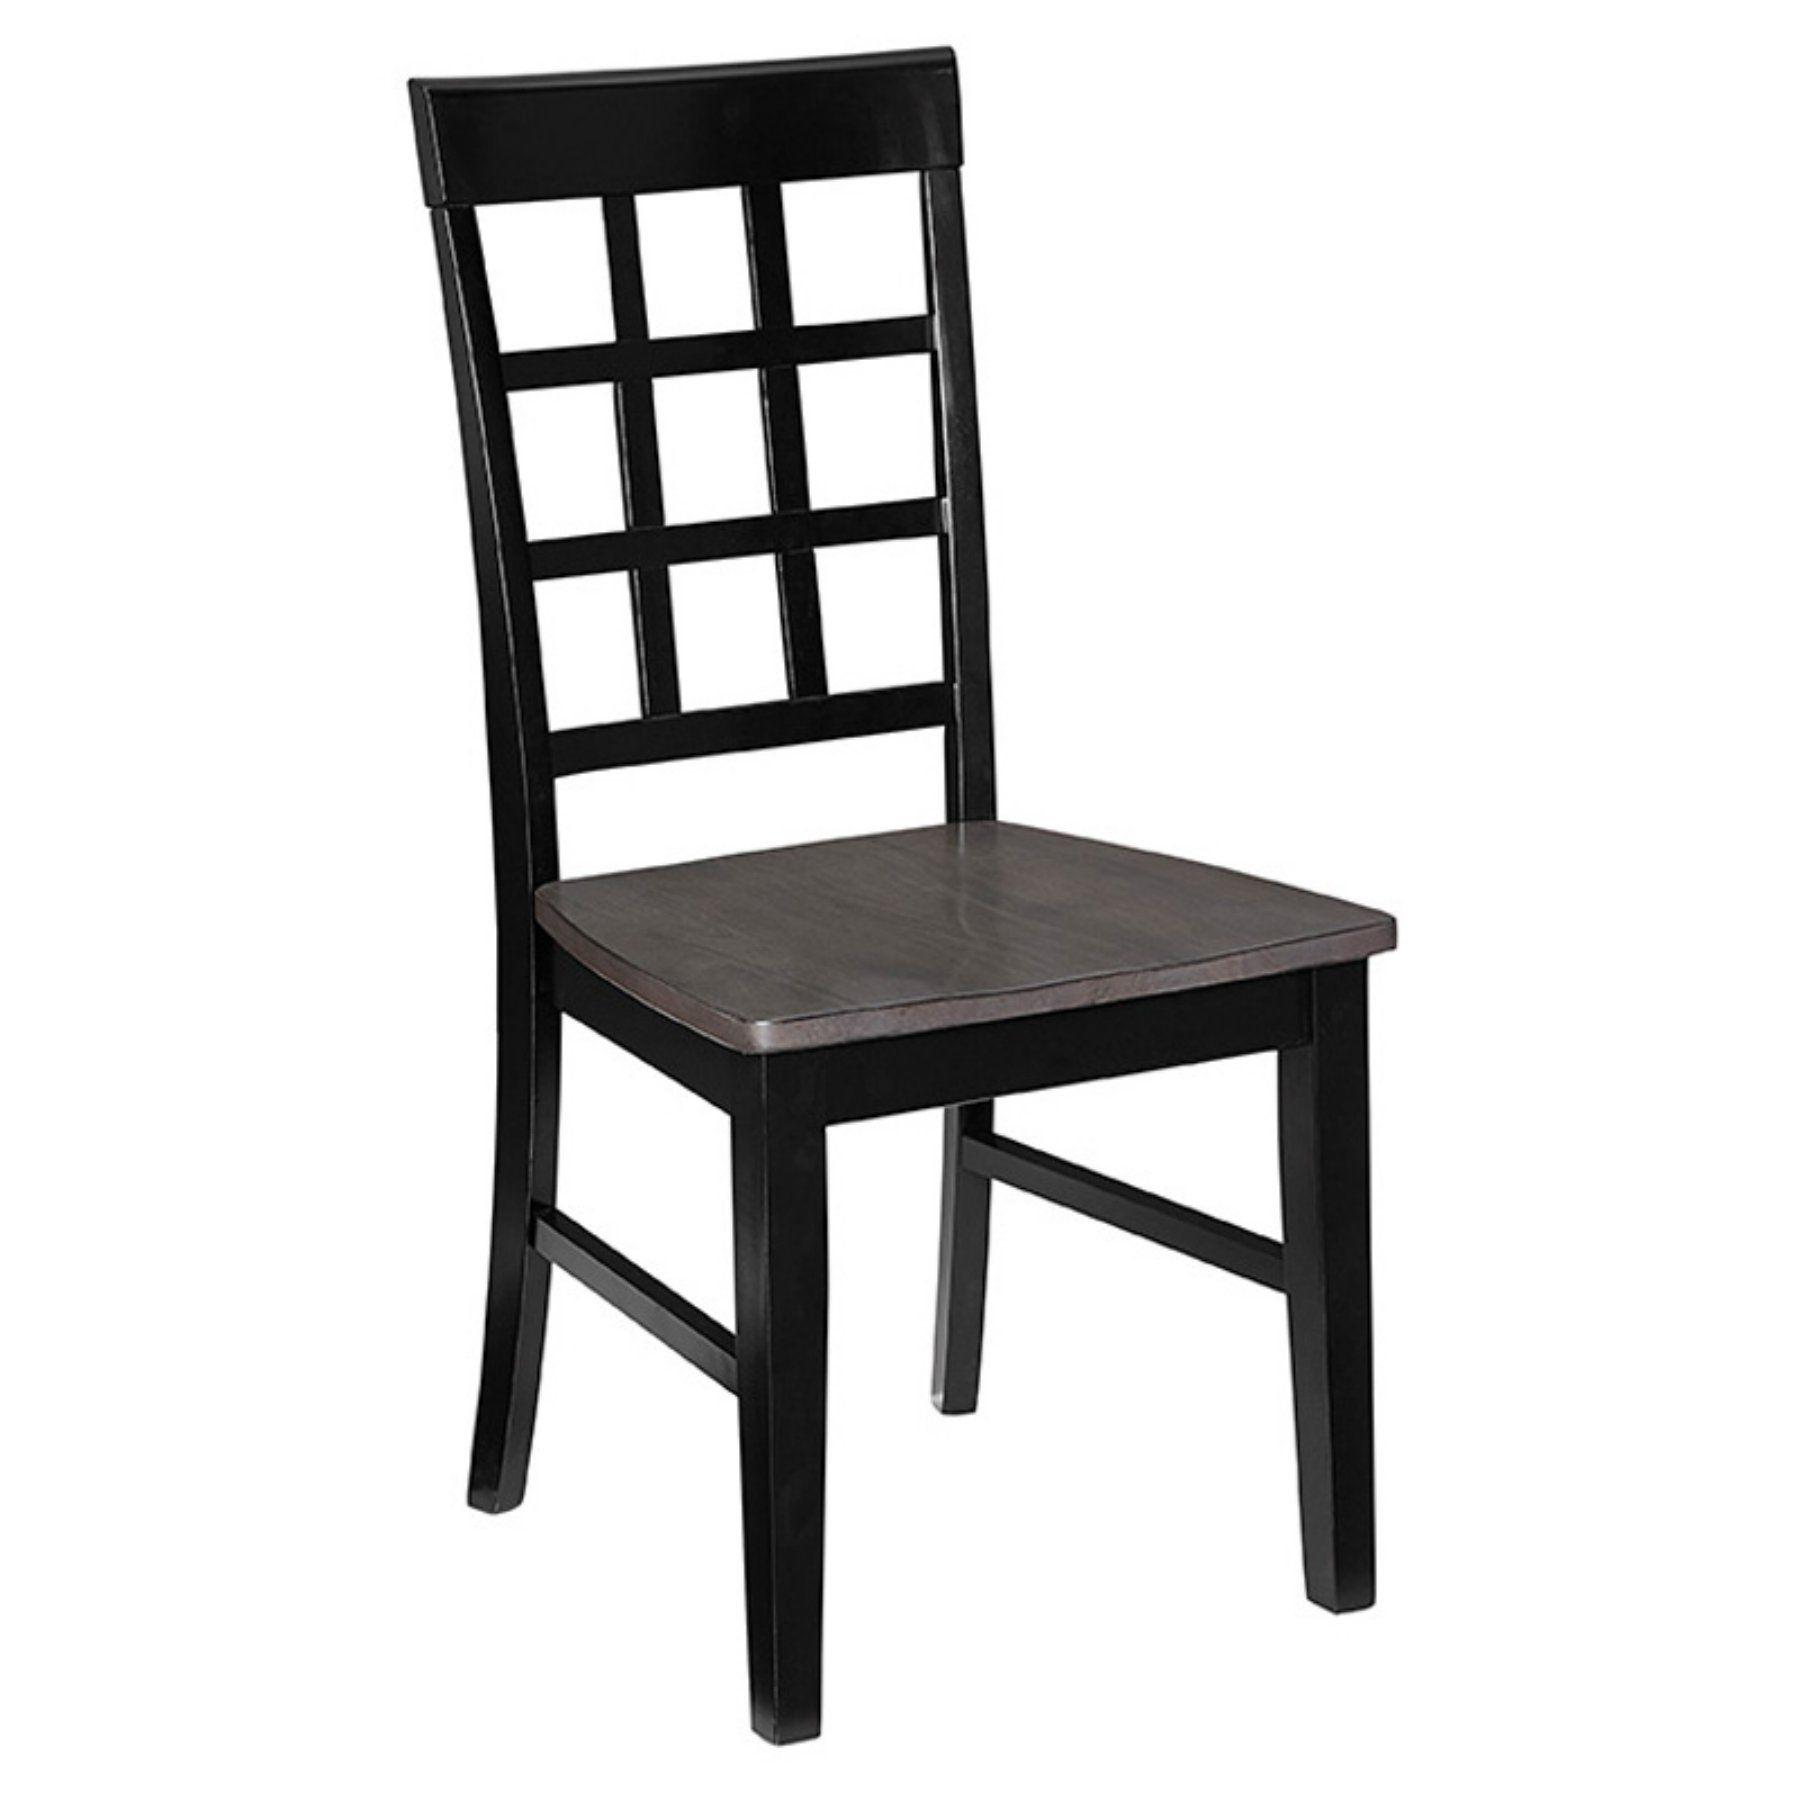 Progressive Furniture Salem Lattice Back Dining Side Chair Set